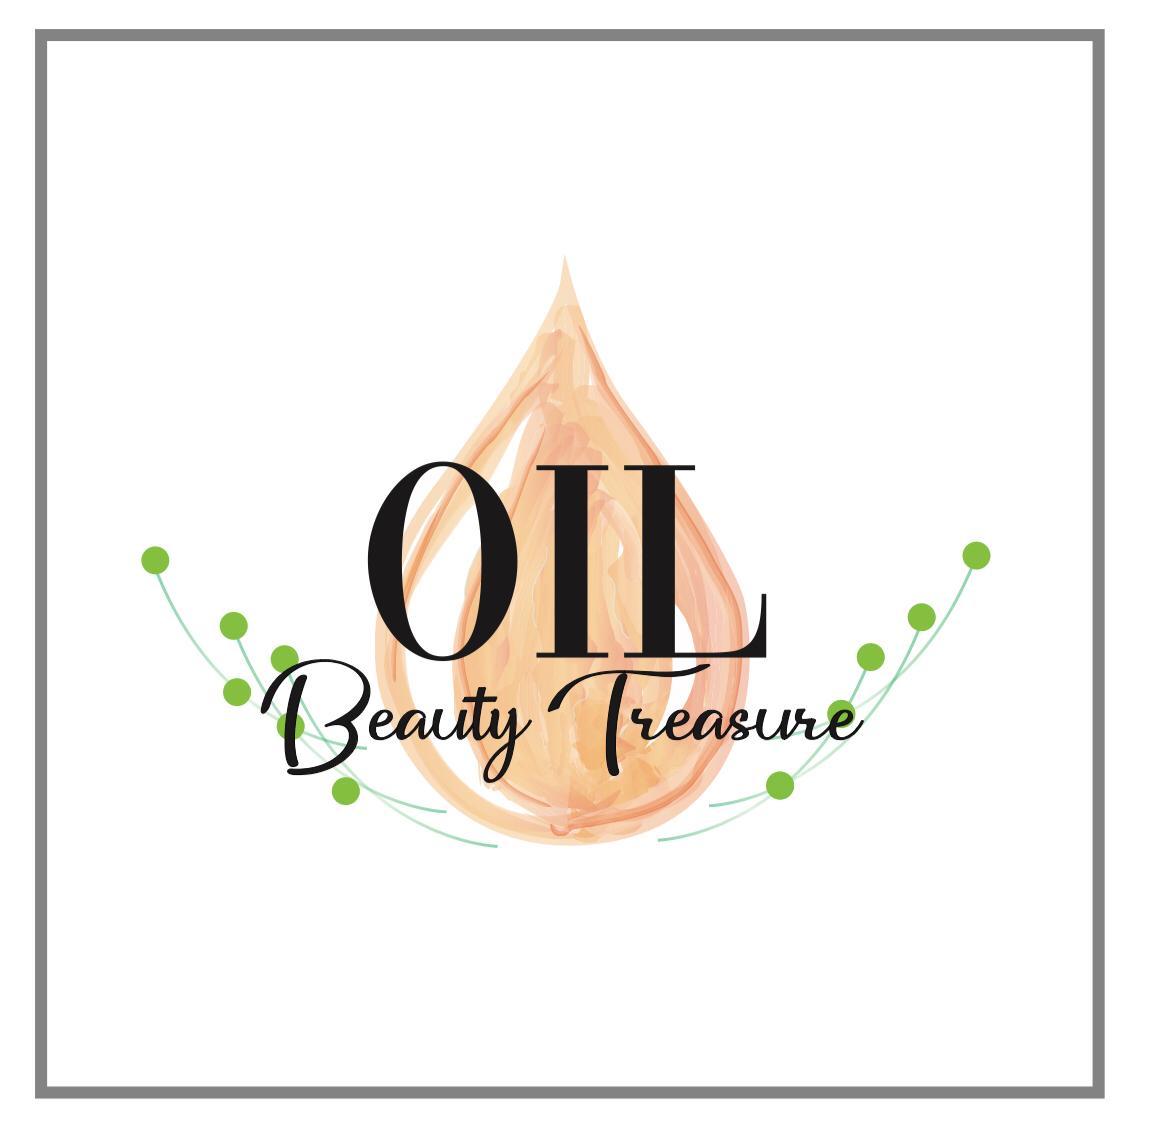 Oil Beauty Treasure